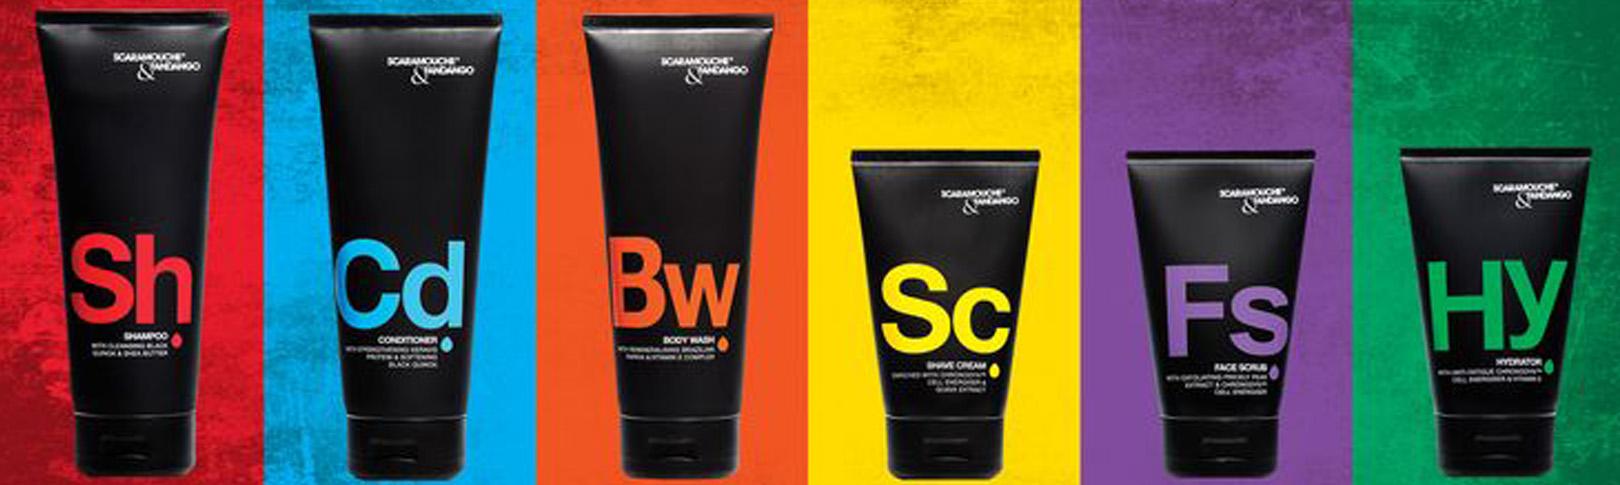 brands-image-scaramouche-and-fandango.jpg